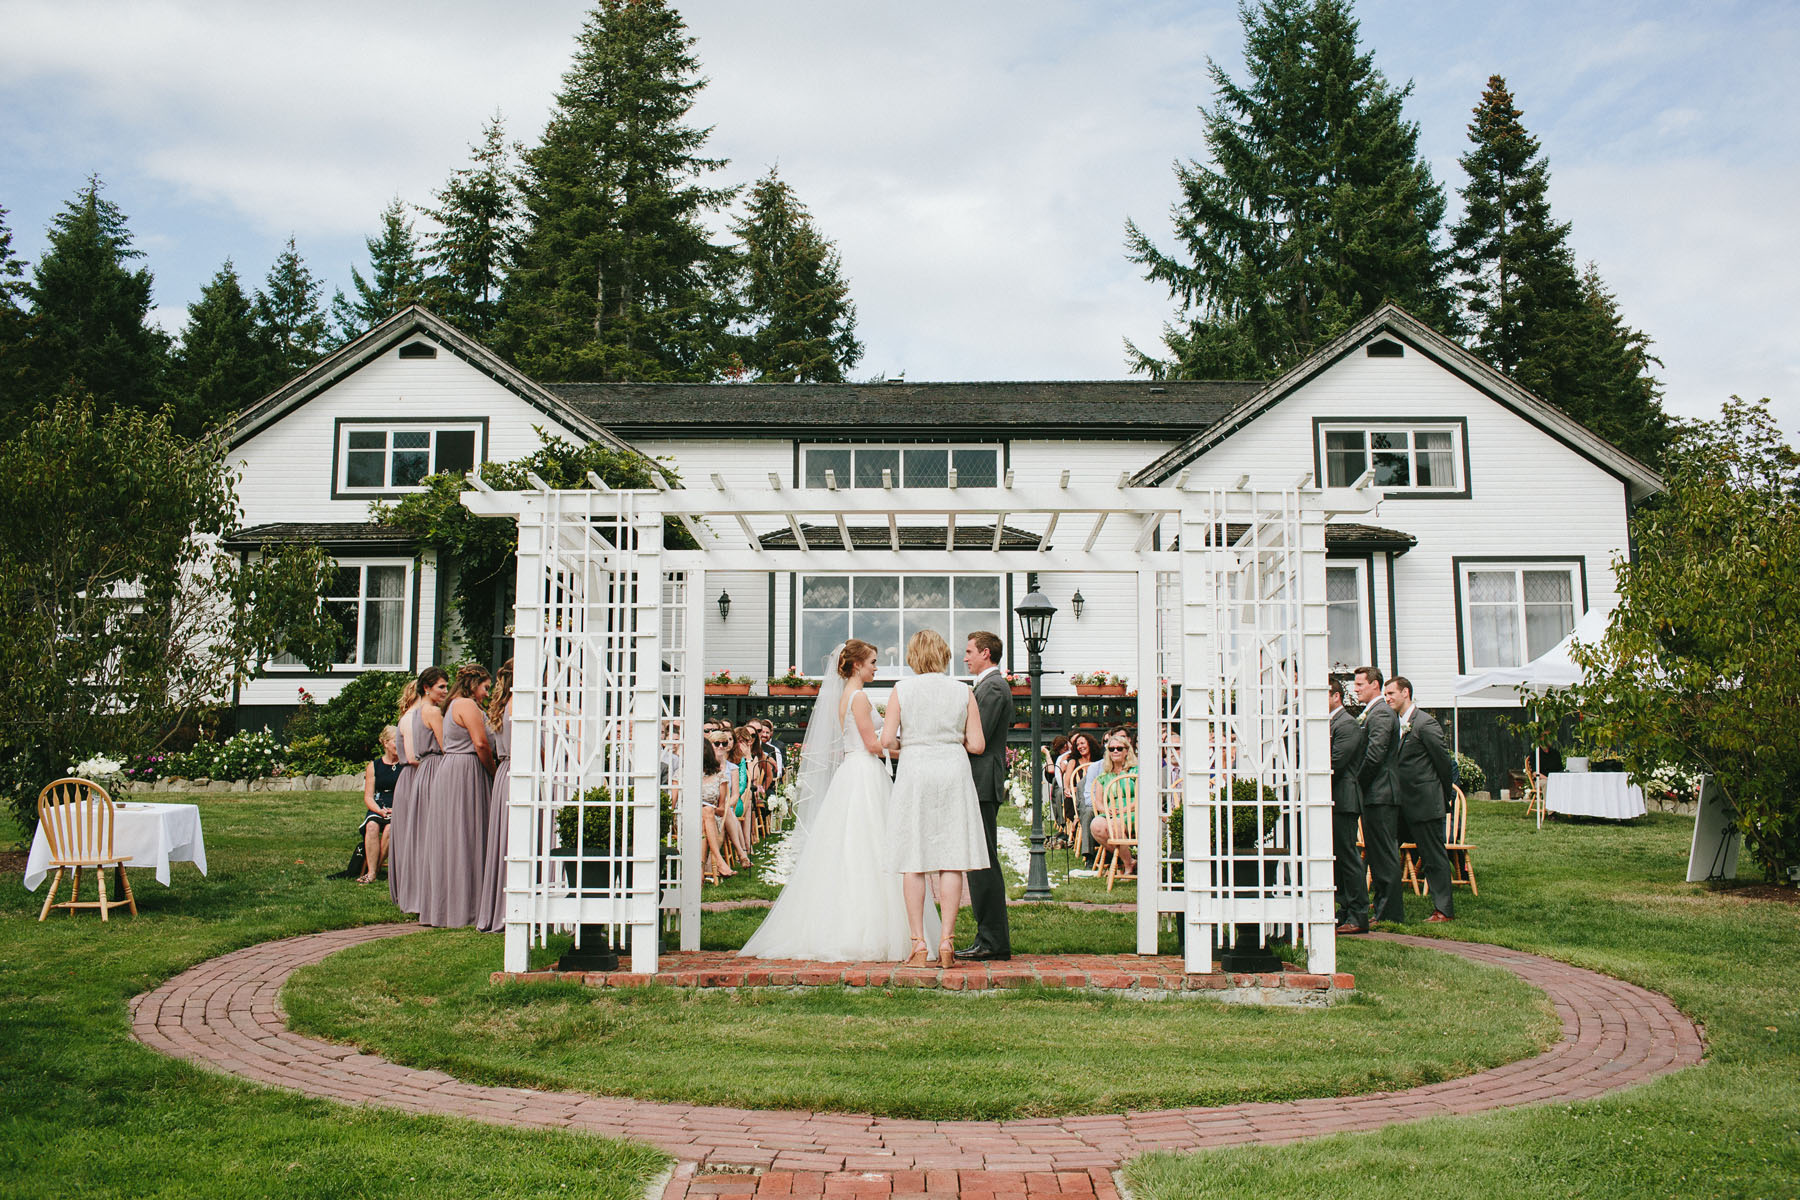 thetis-island-wedding-photographer-rp-rn-087.jpg